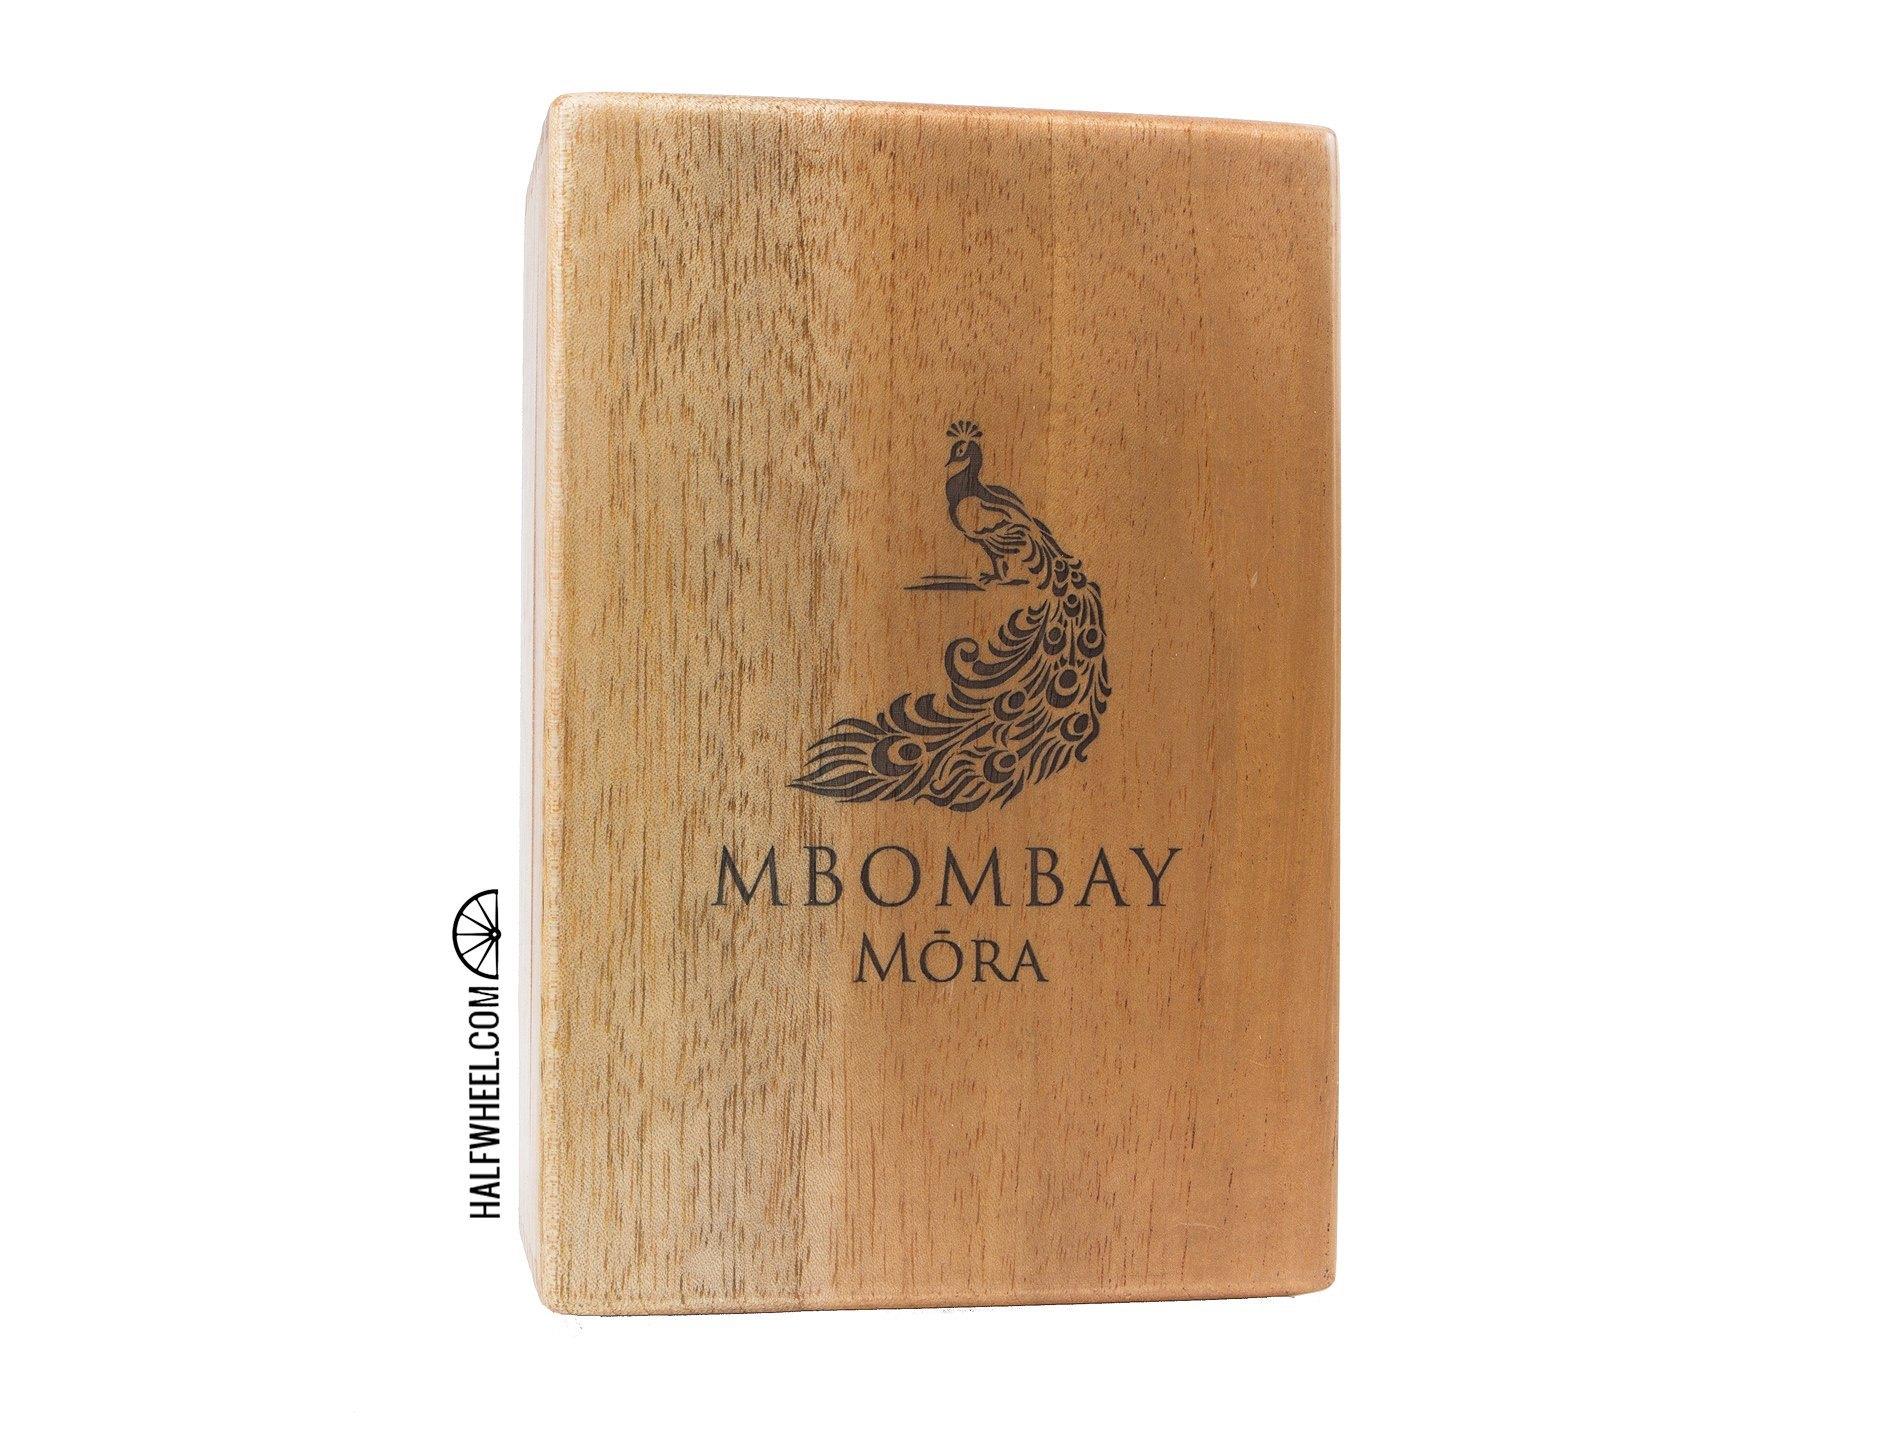 MBombay Mora 2